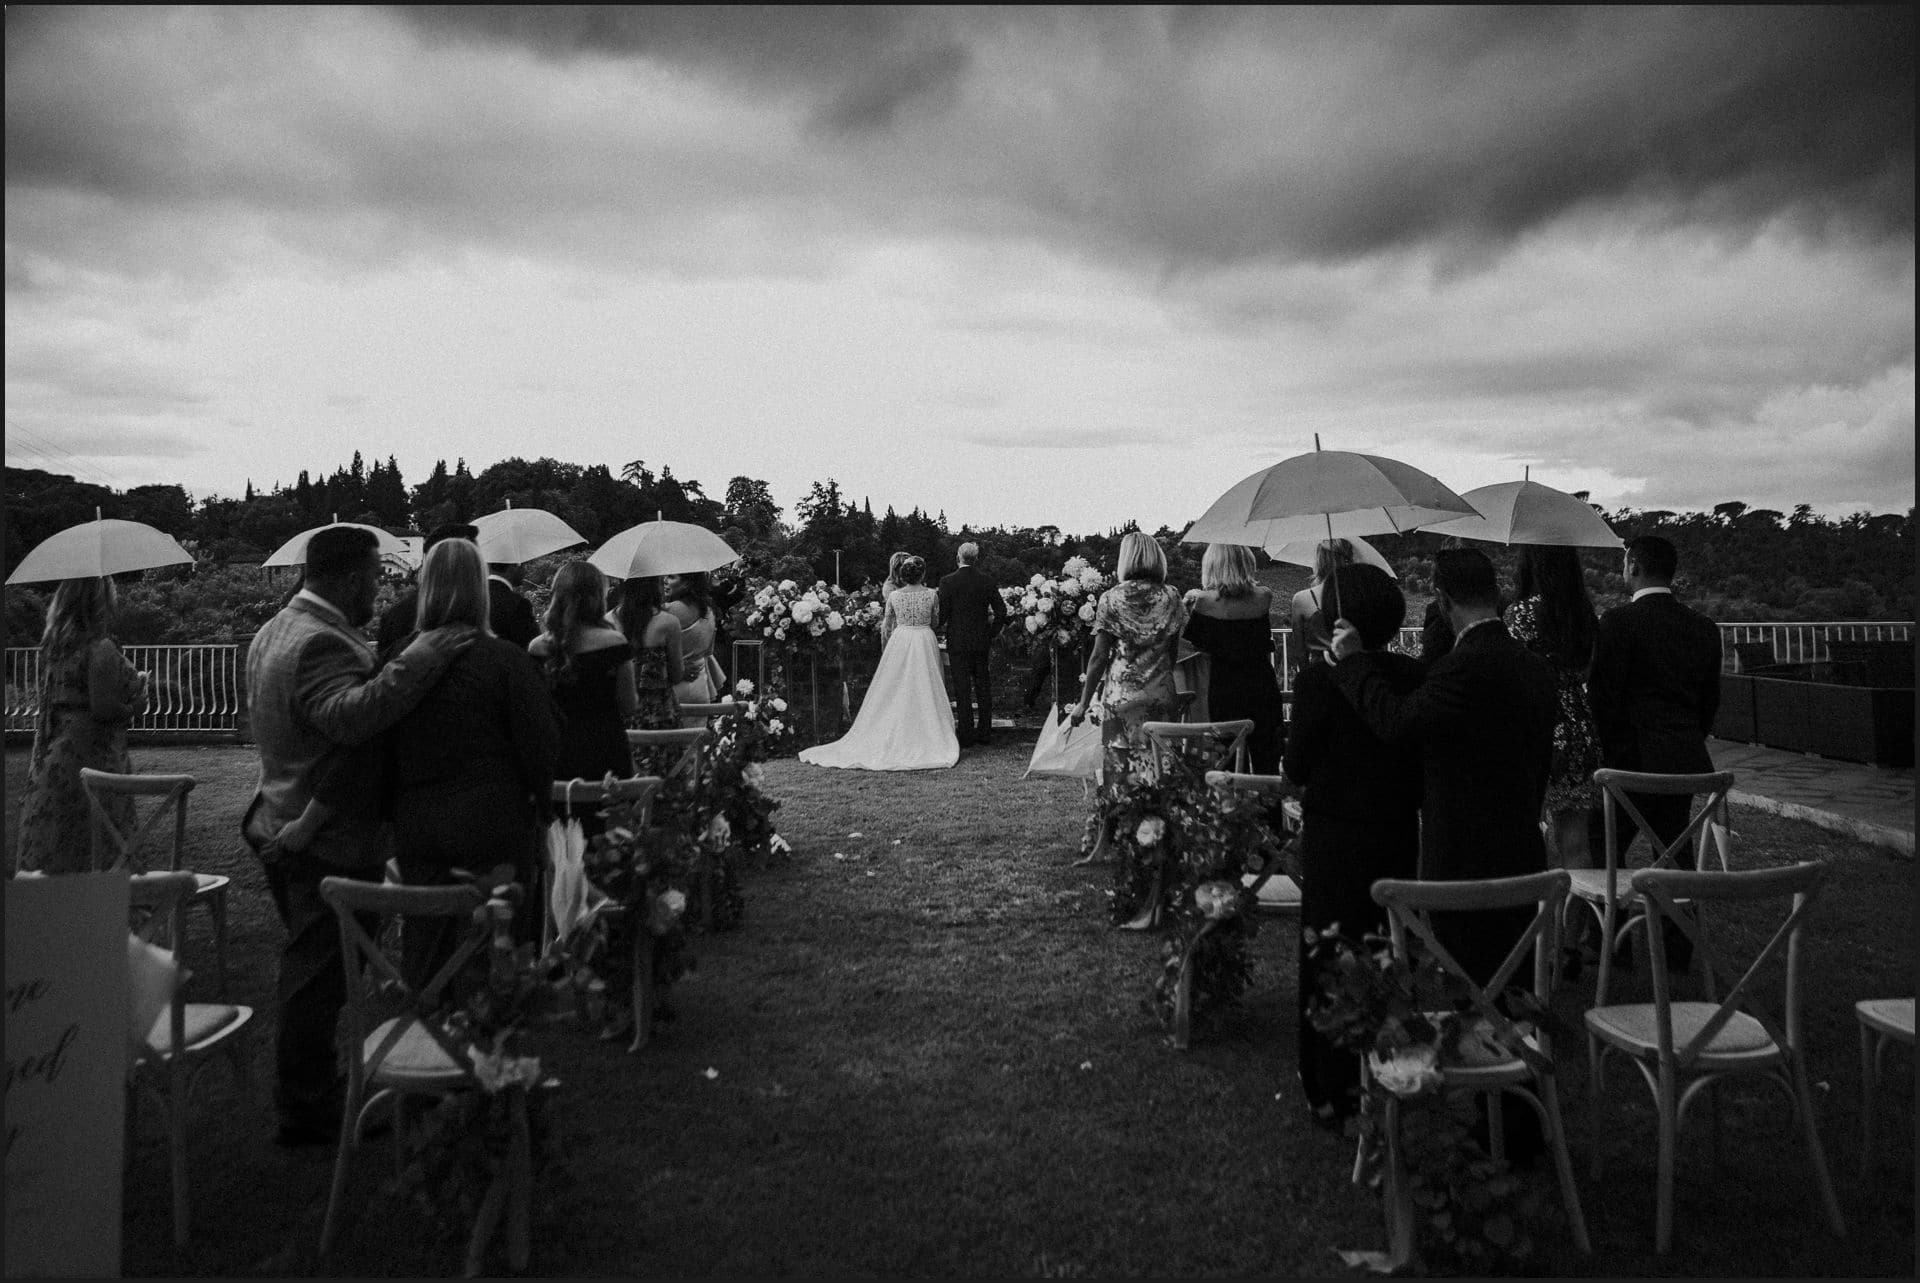 tuscany, destination wedding, chianti, wedding ceremony, bride, groom, black and white